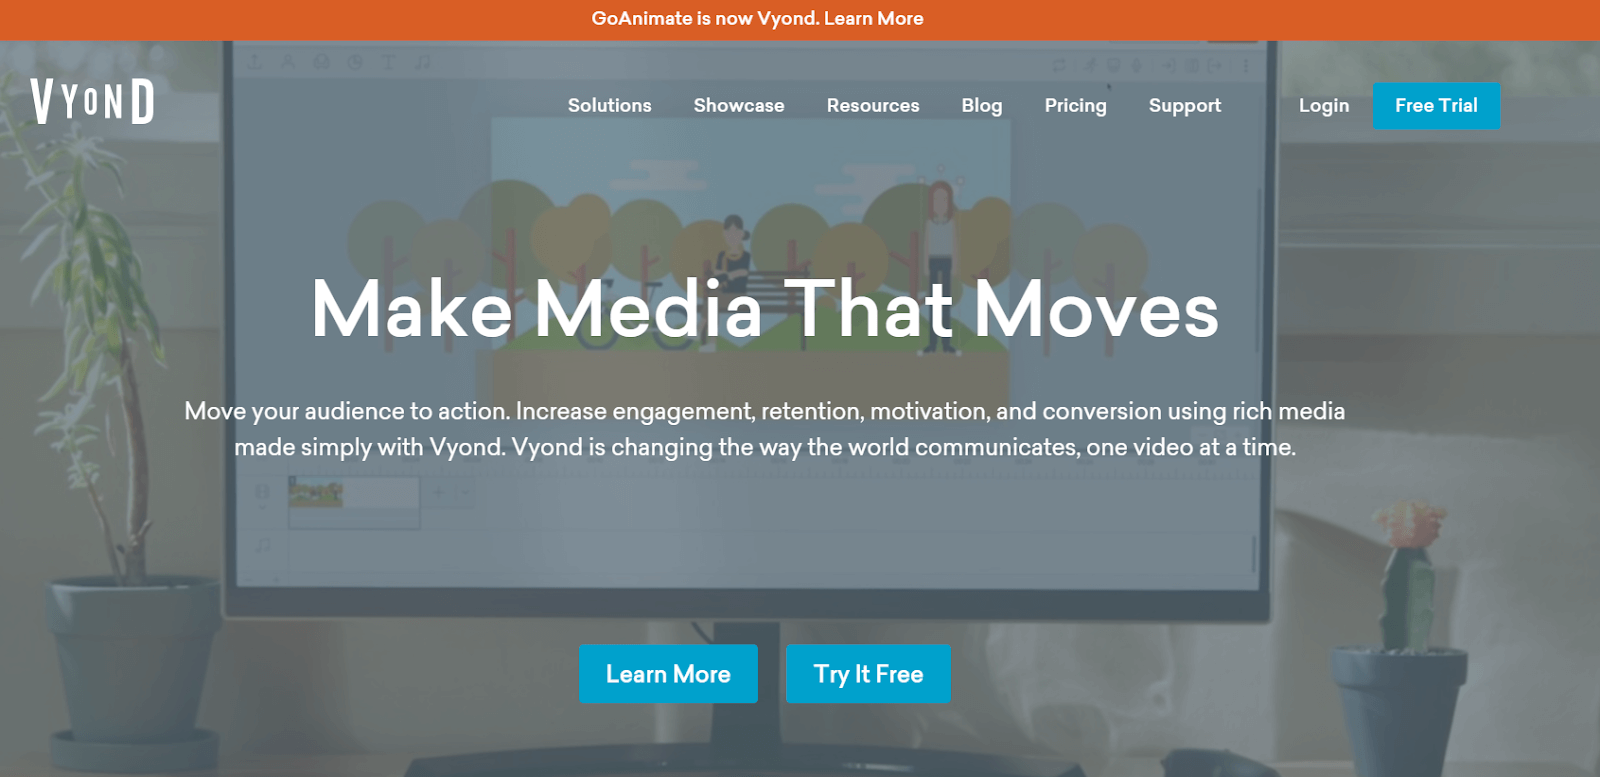 Vyond Video Marketing Tool